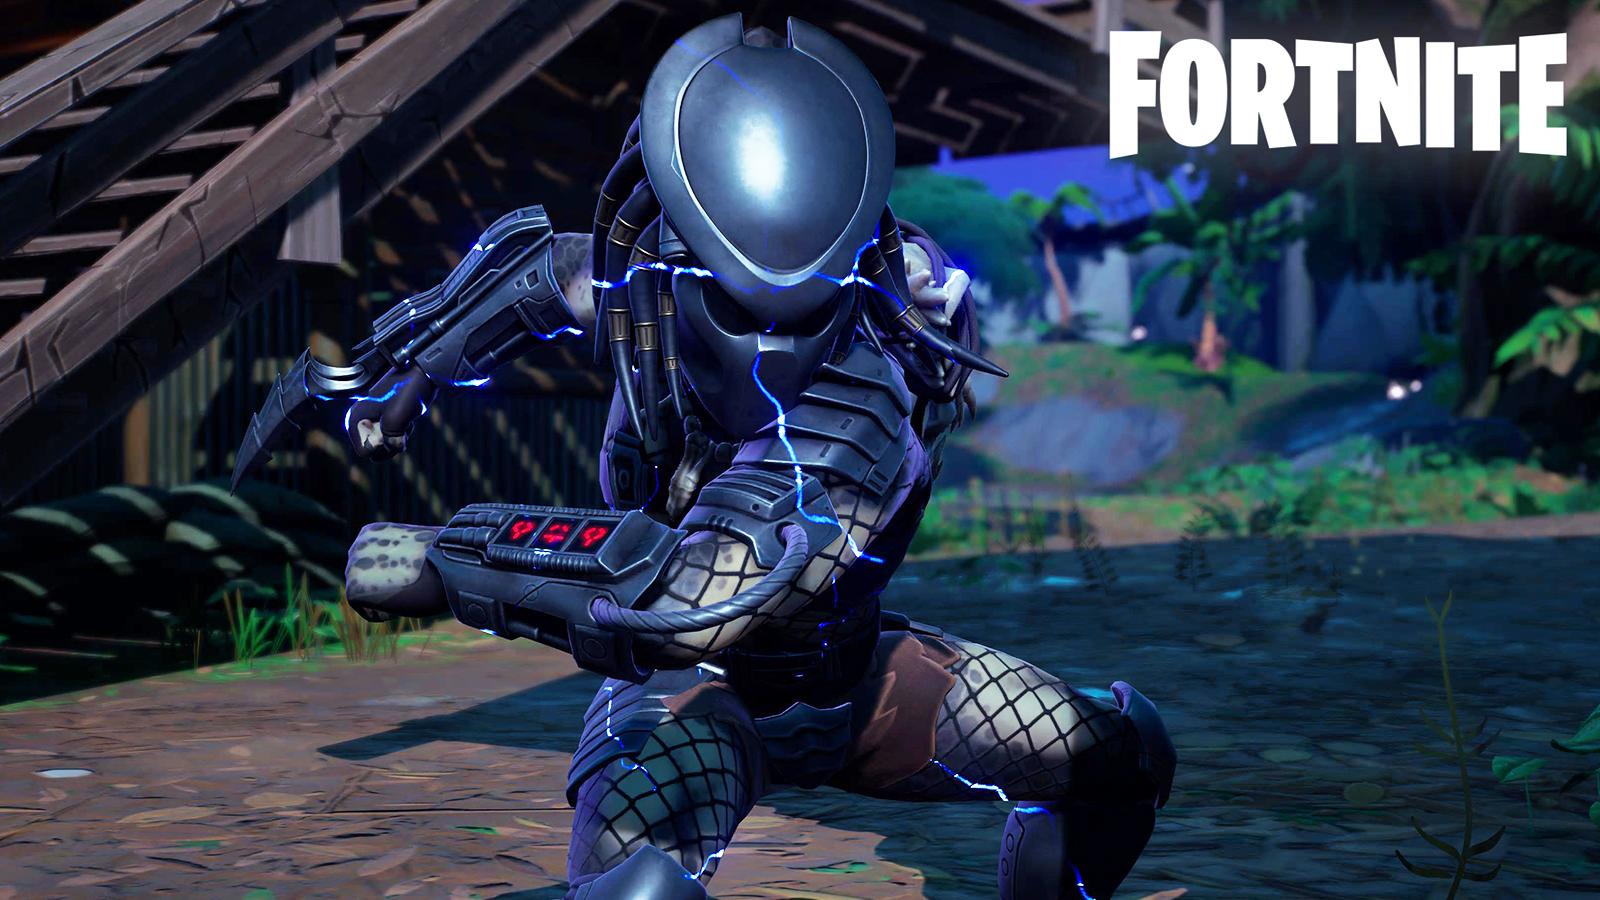 Predator Boss Fortnite